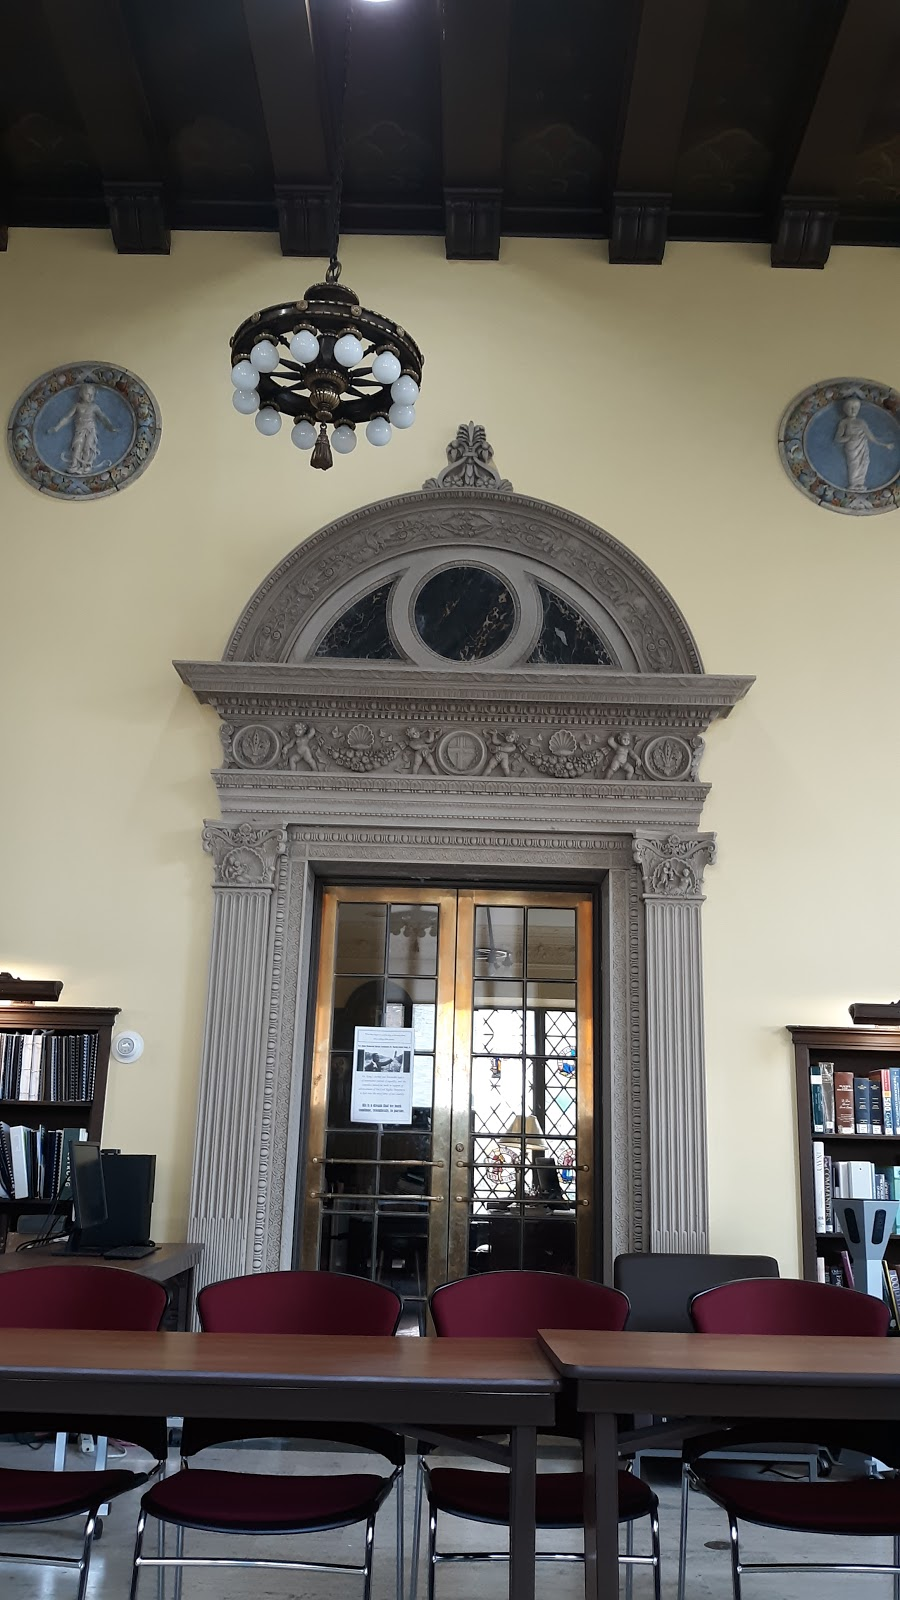 B.F. Jones Memorial Library - library    Photo 3 of 7   Address: 663 Franklin Ave, Aliquippa, PA 15001, USA   Phone: (724) 375-2900